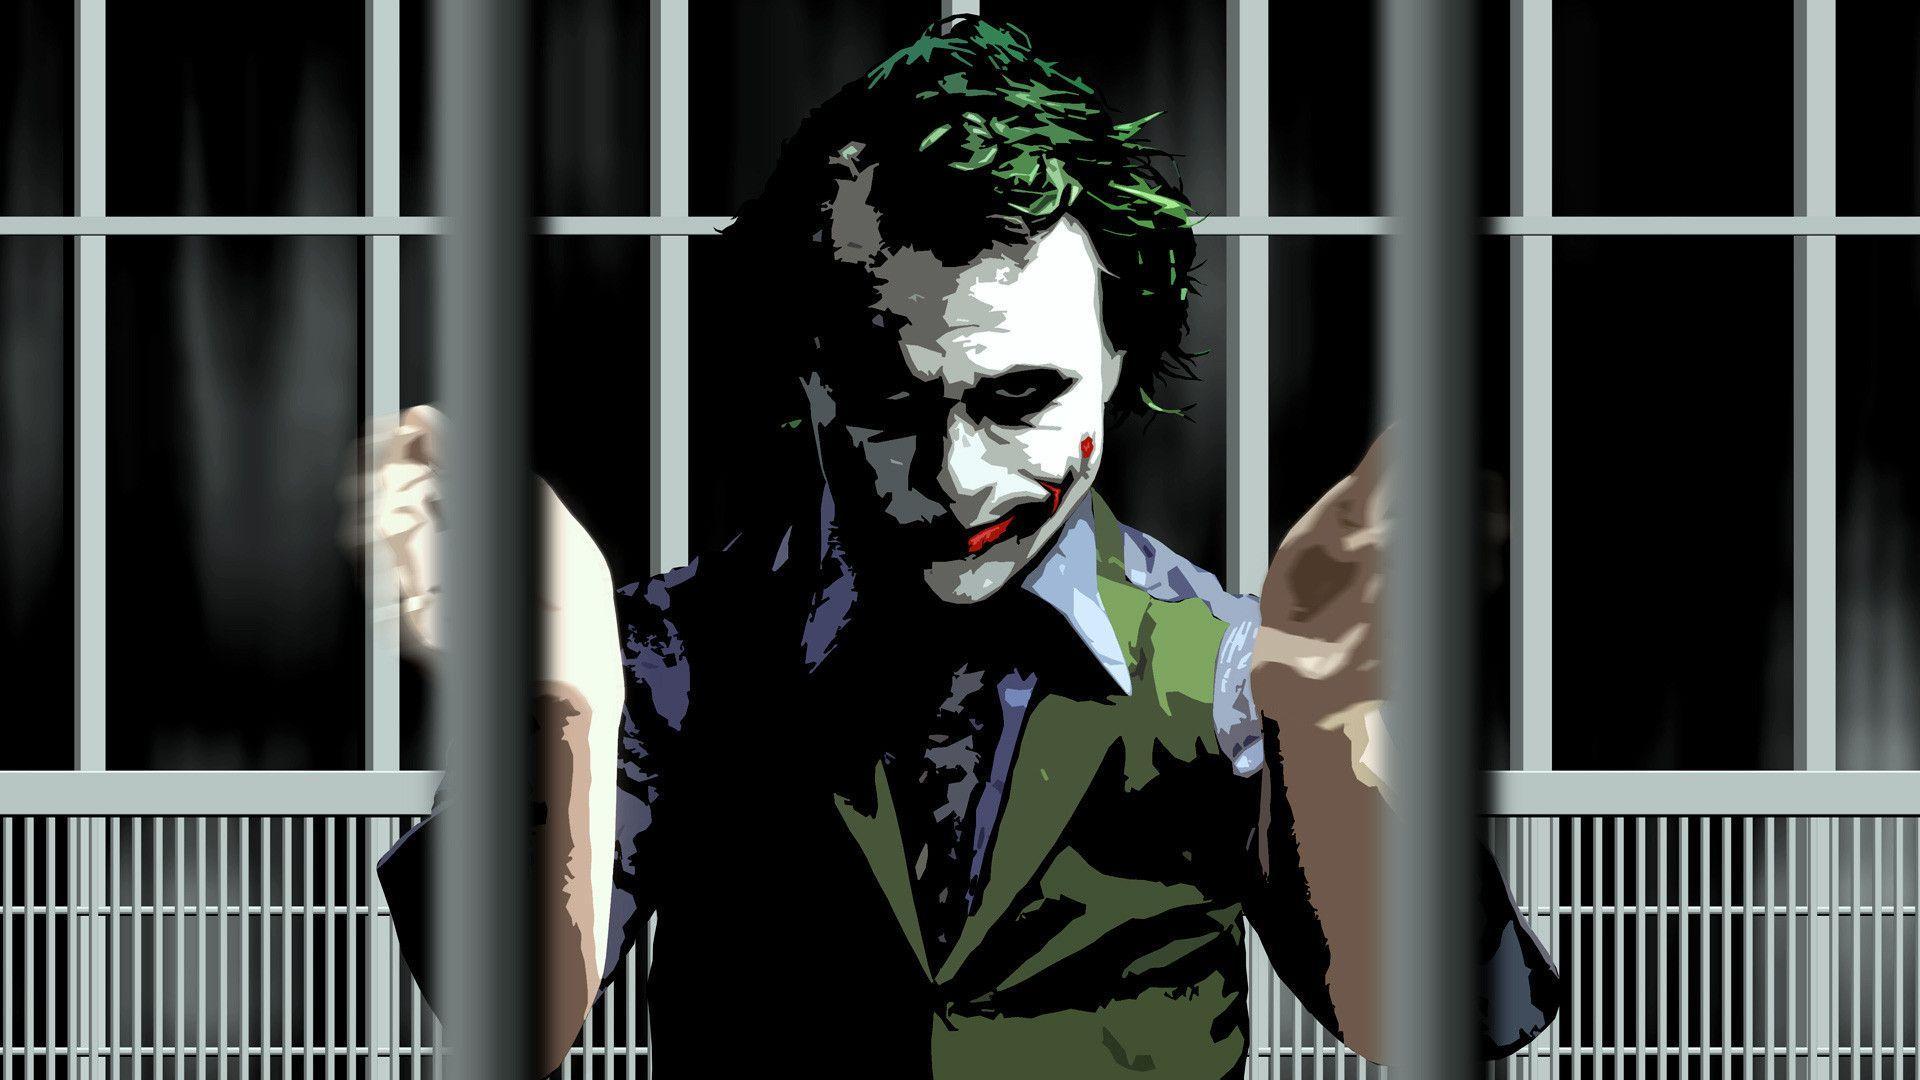 Joker The Dark Knight Wallpapers Wallpaper Cave